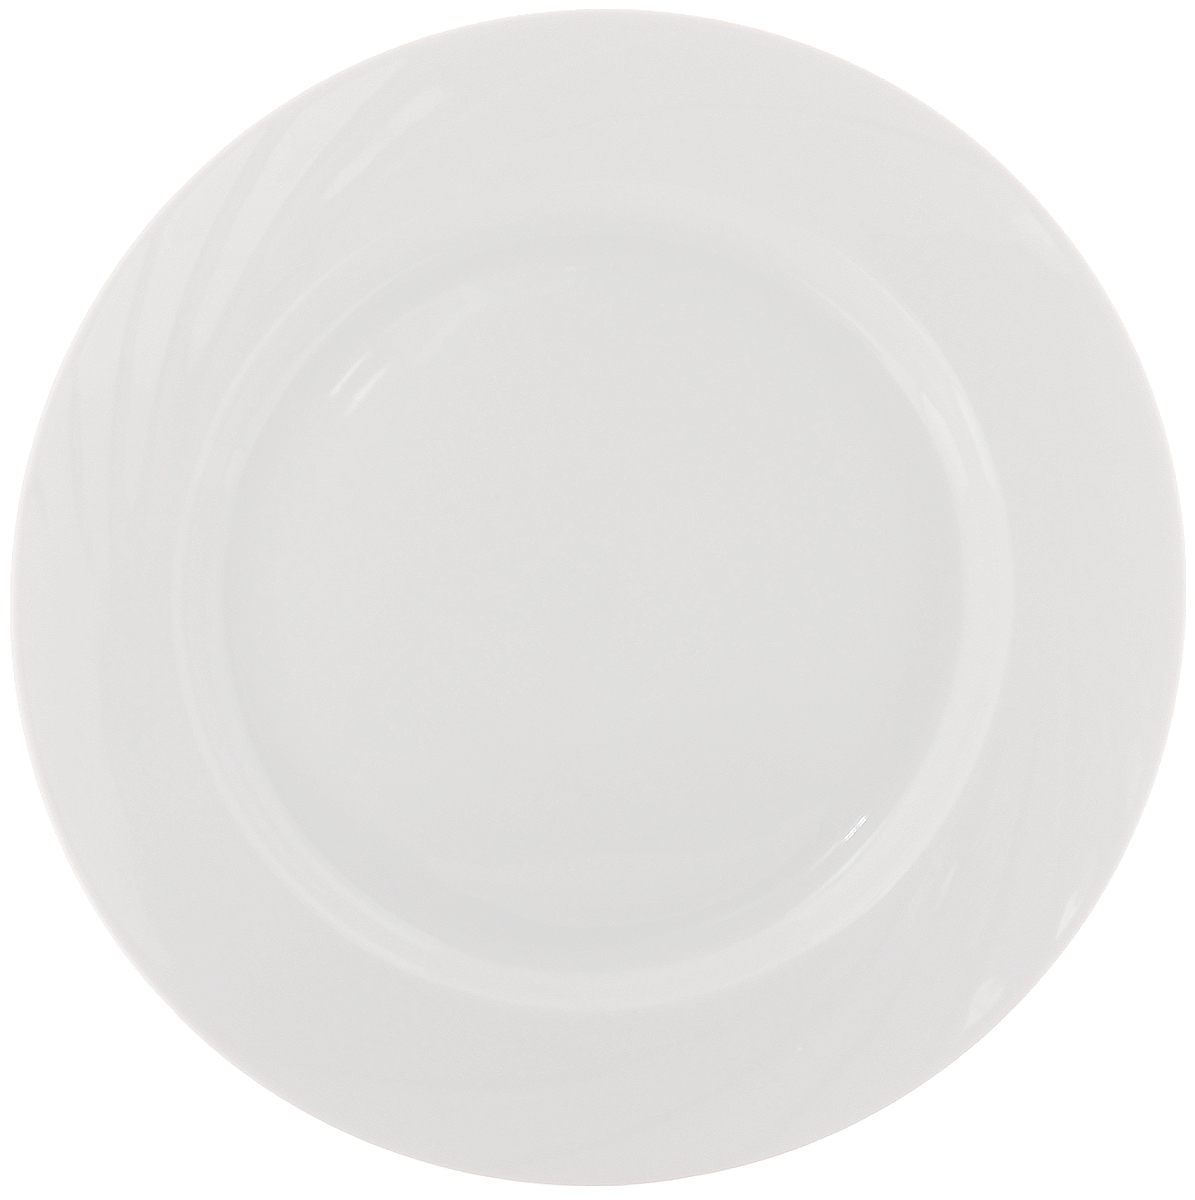 Тарелка Голубка. Белье, диаметр 24 см селедочница голубка ассорти длина 25 см